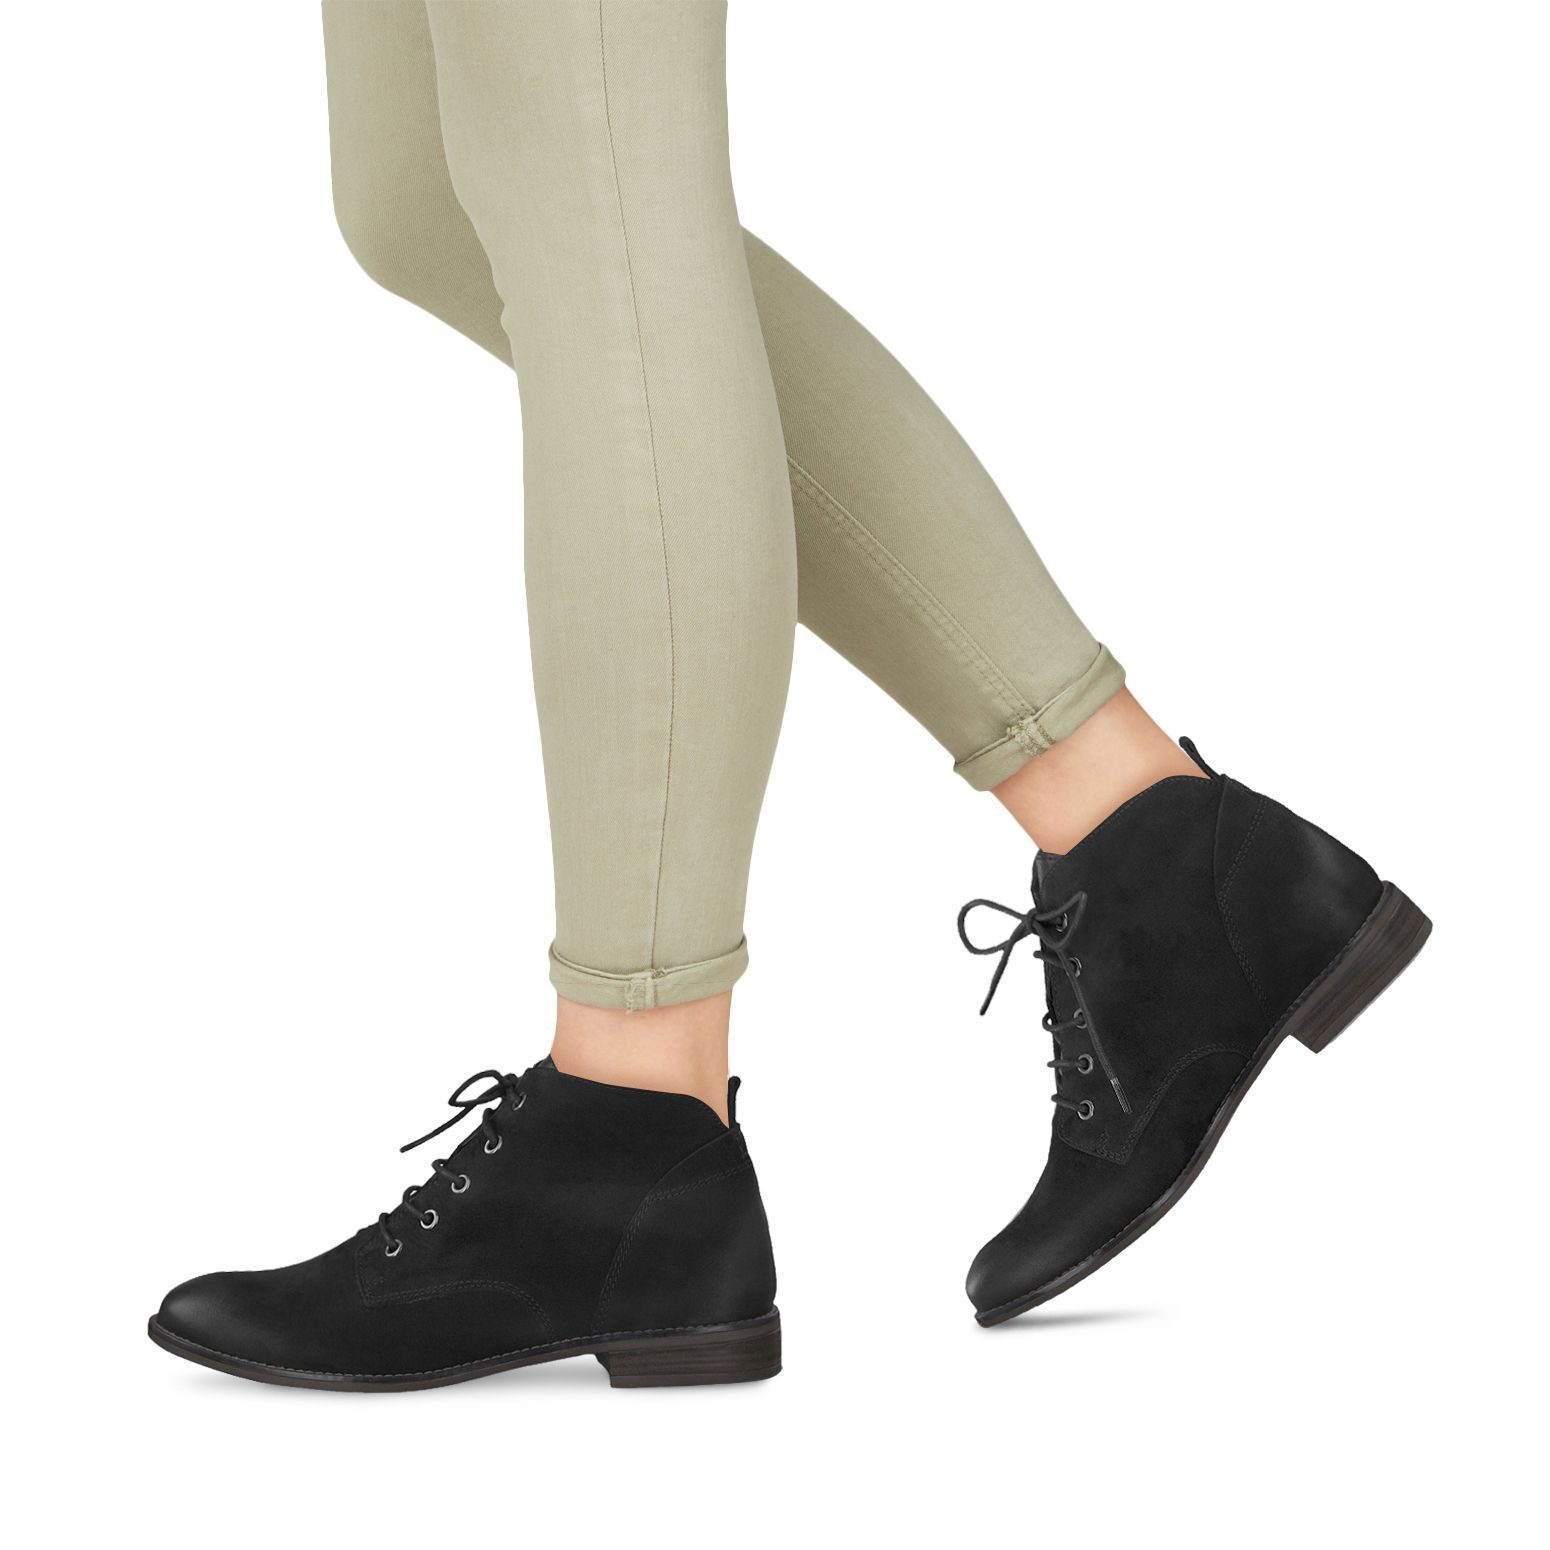 531f9d2d0b9187 Pantin 1-1-25100-20  Tamaris Stiefeletten online kaufen!